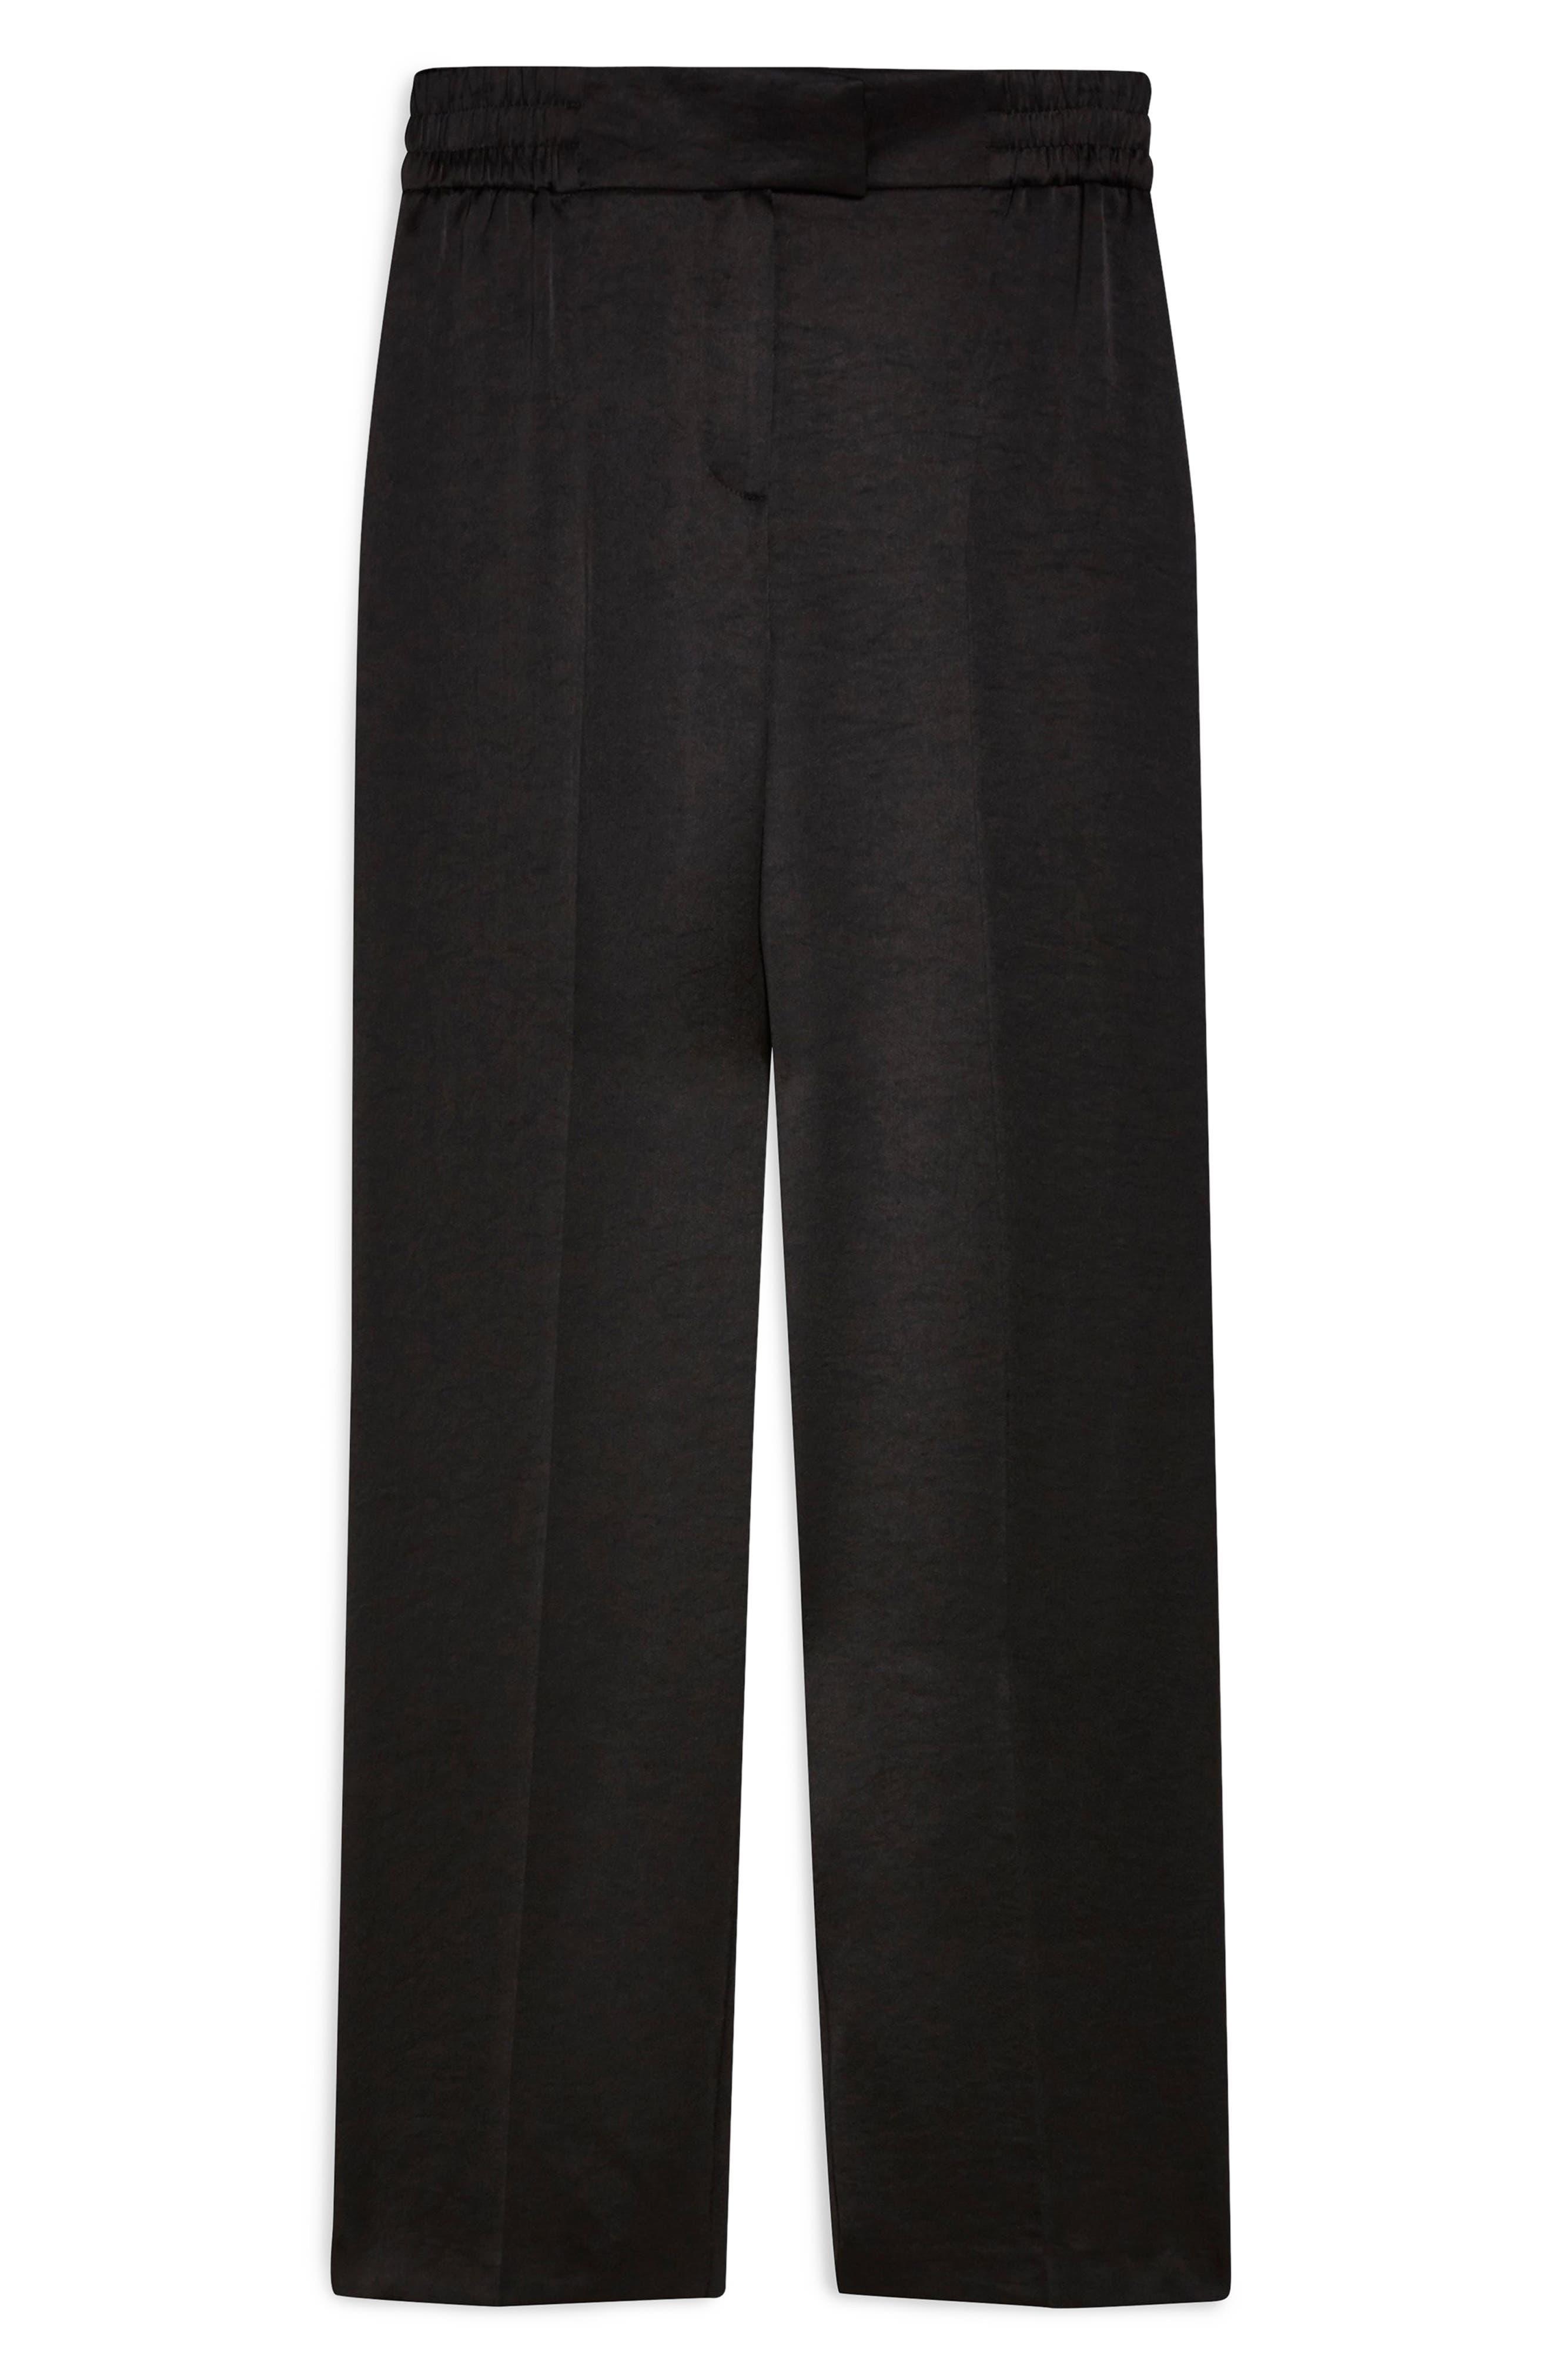 TOPSHOP, Elastic Satin Trousers, Alternate thumbnail 4, color, 001